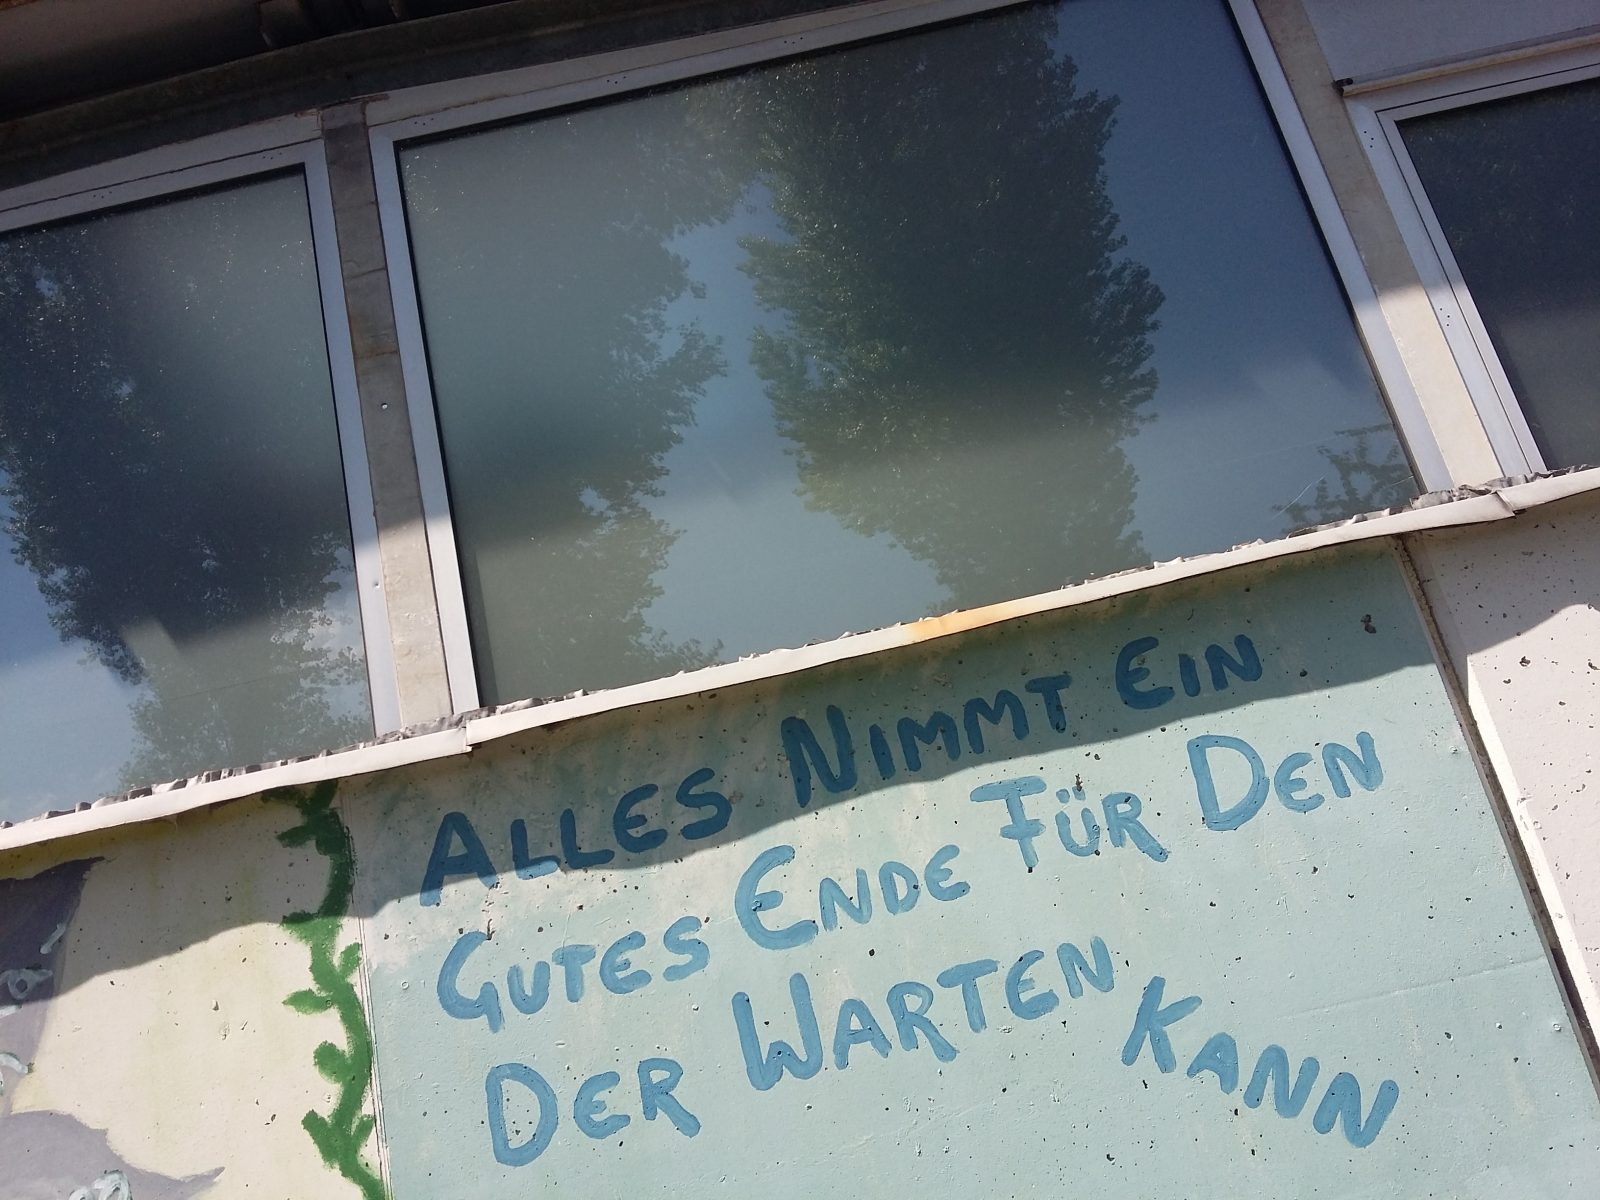 Warten_Thema_Warten_Serviceexperte_Armin_Nagel